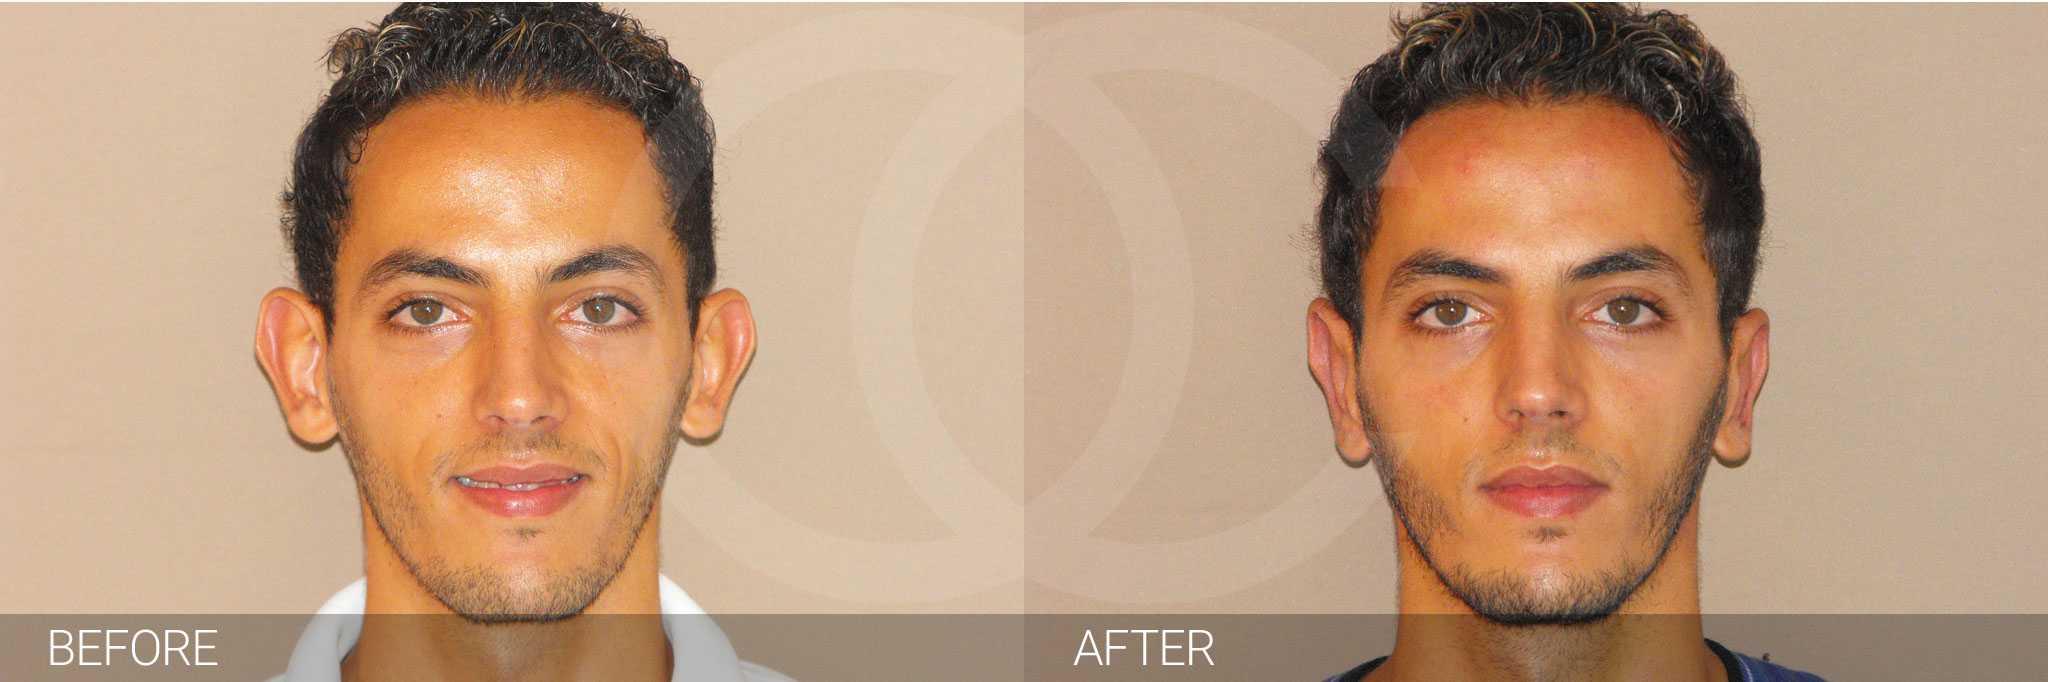 Chirurgie des oreilles 2 ante/post-op I